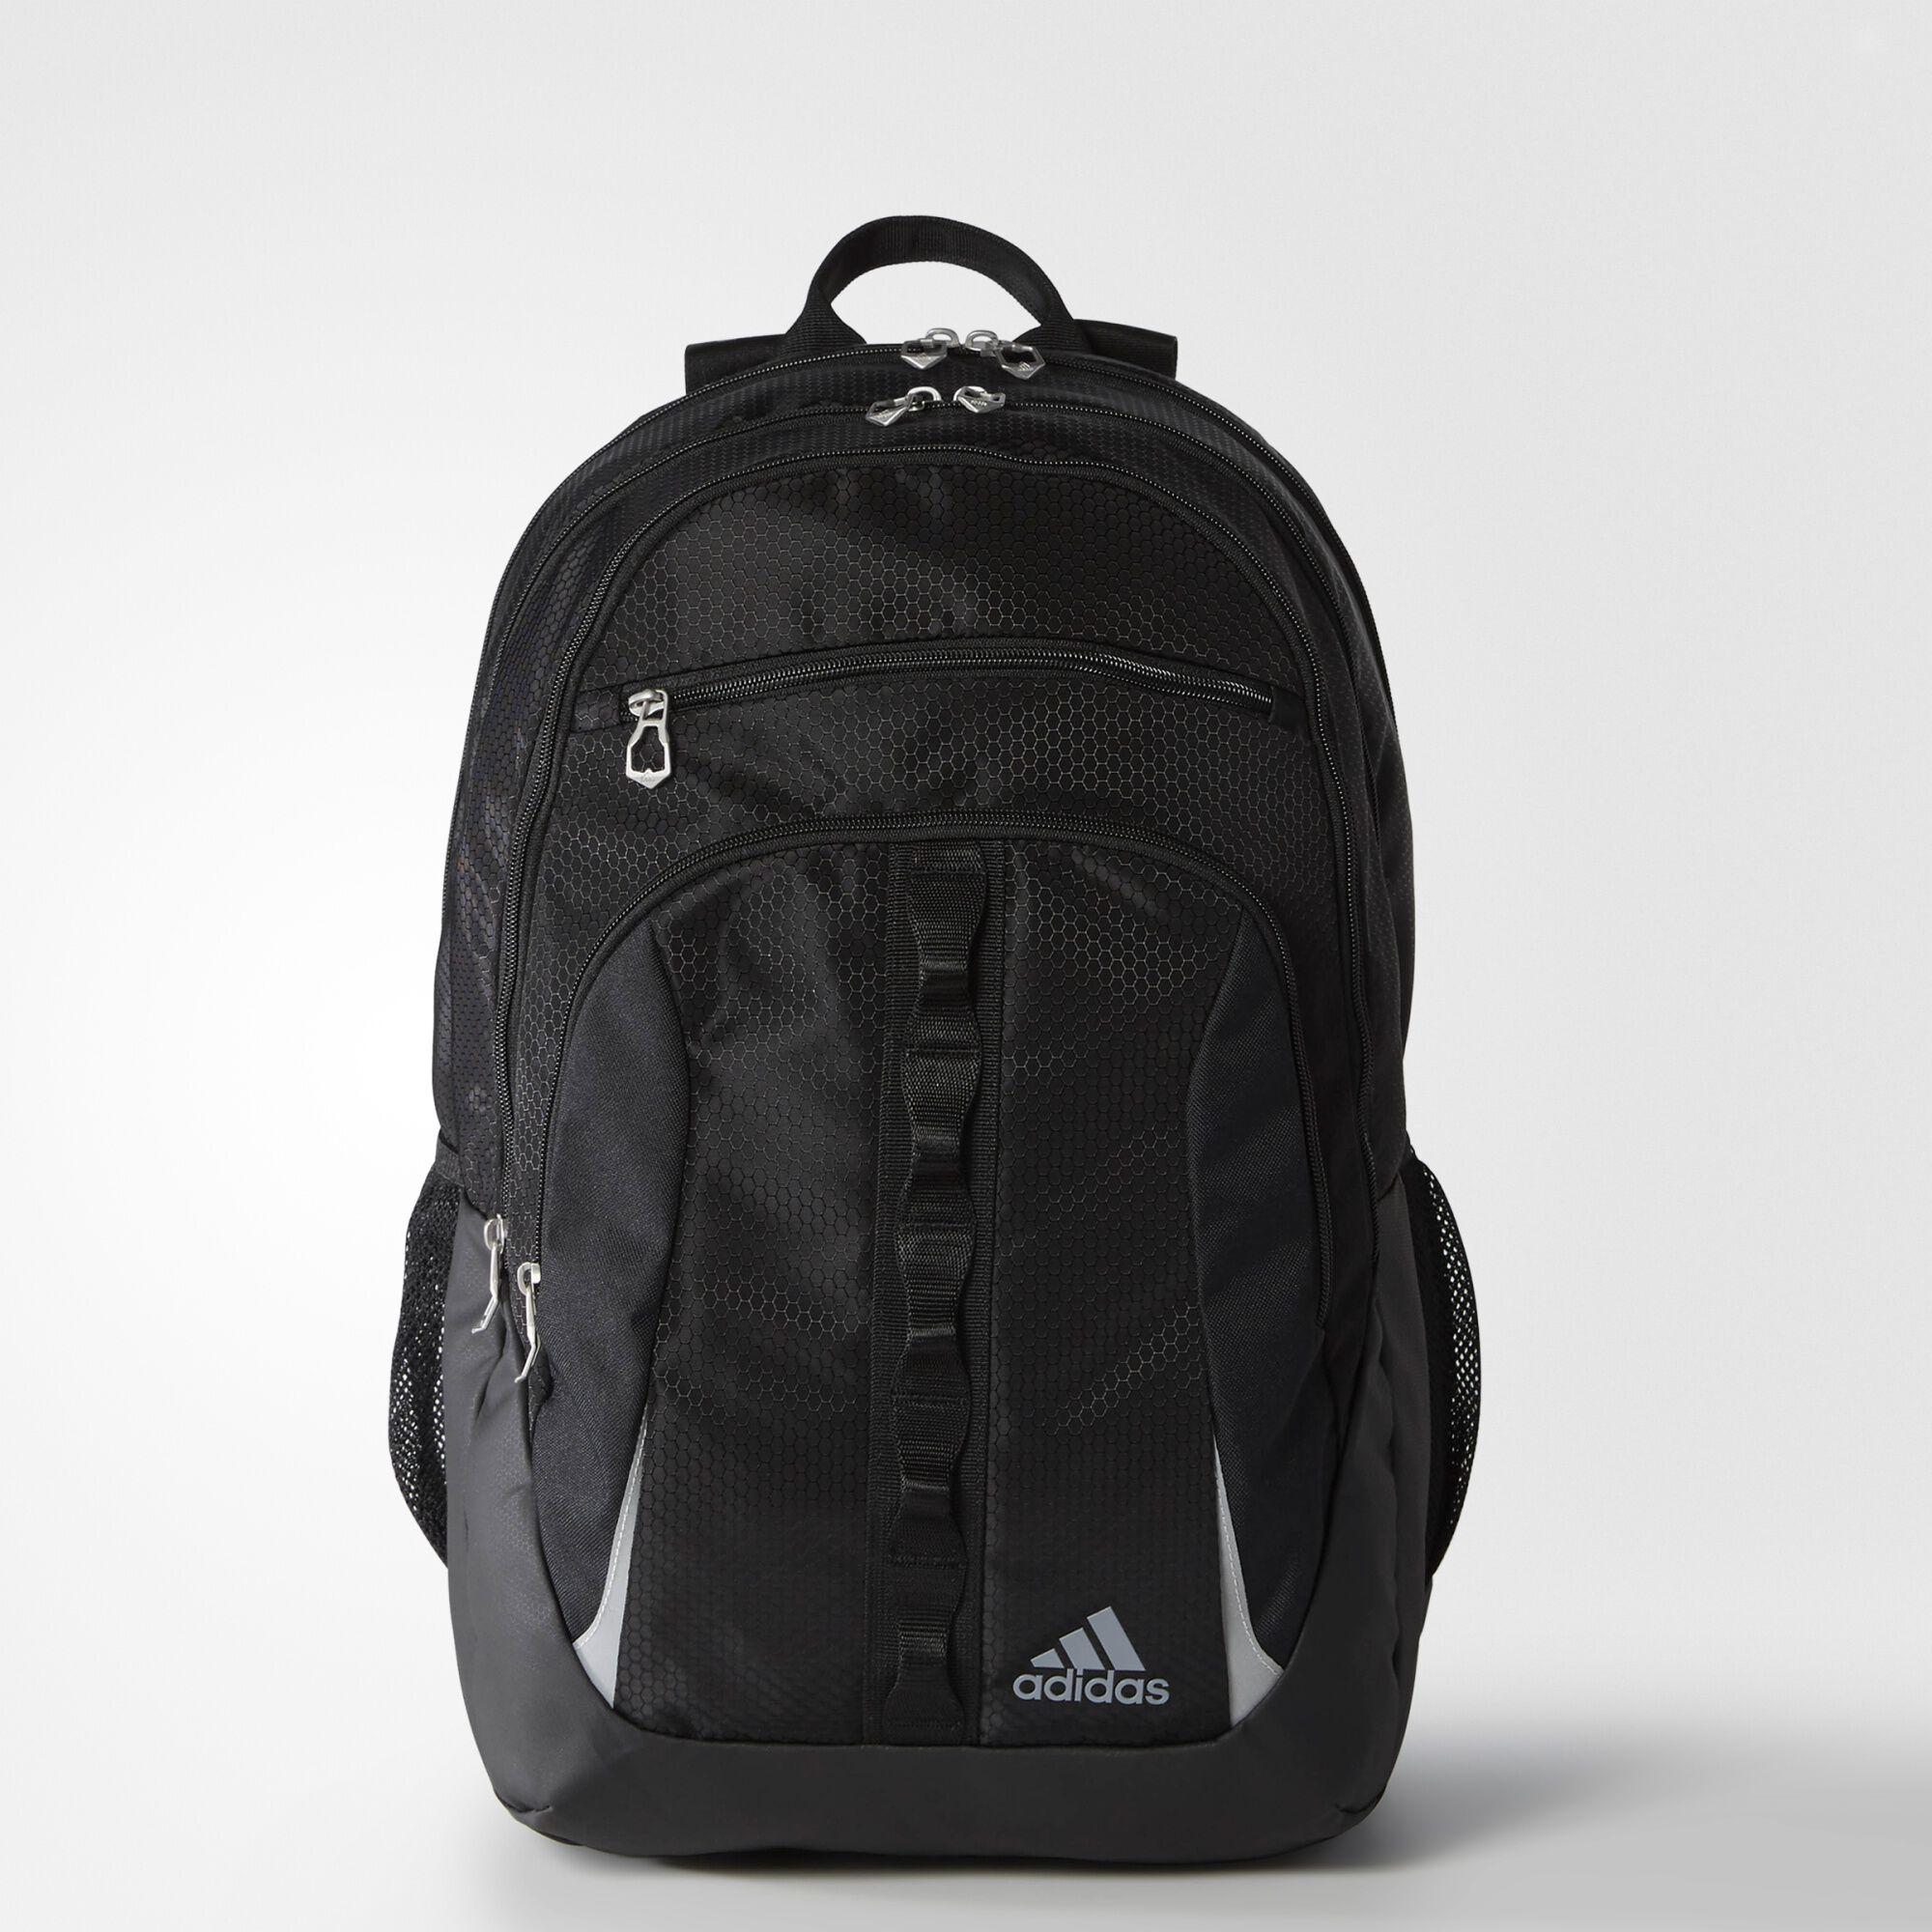 adidas backpack load spring